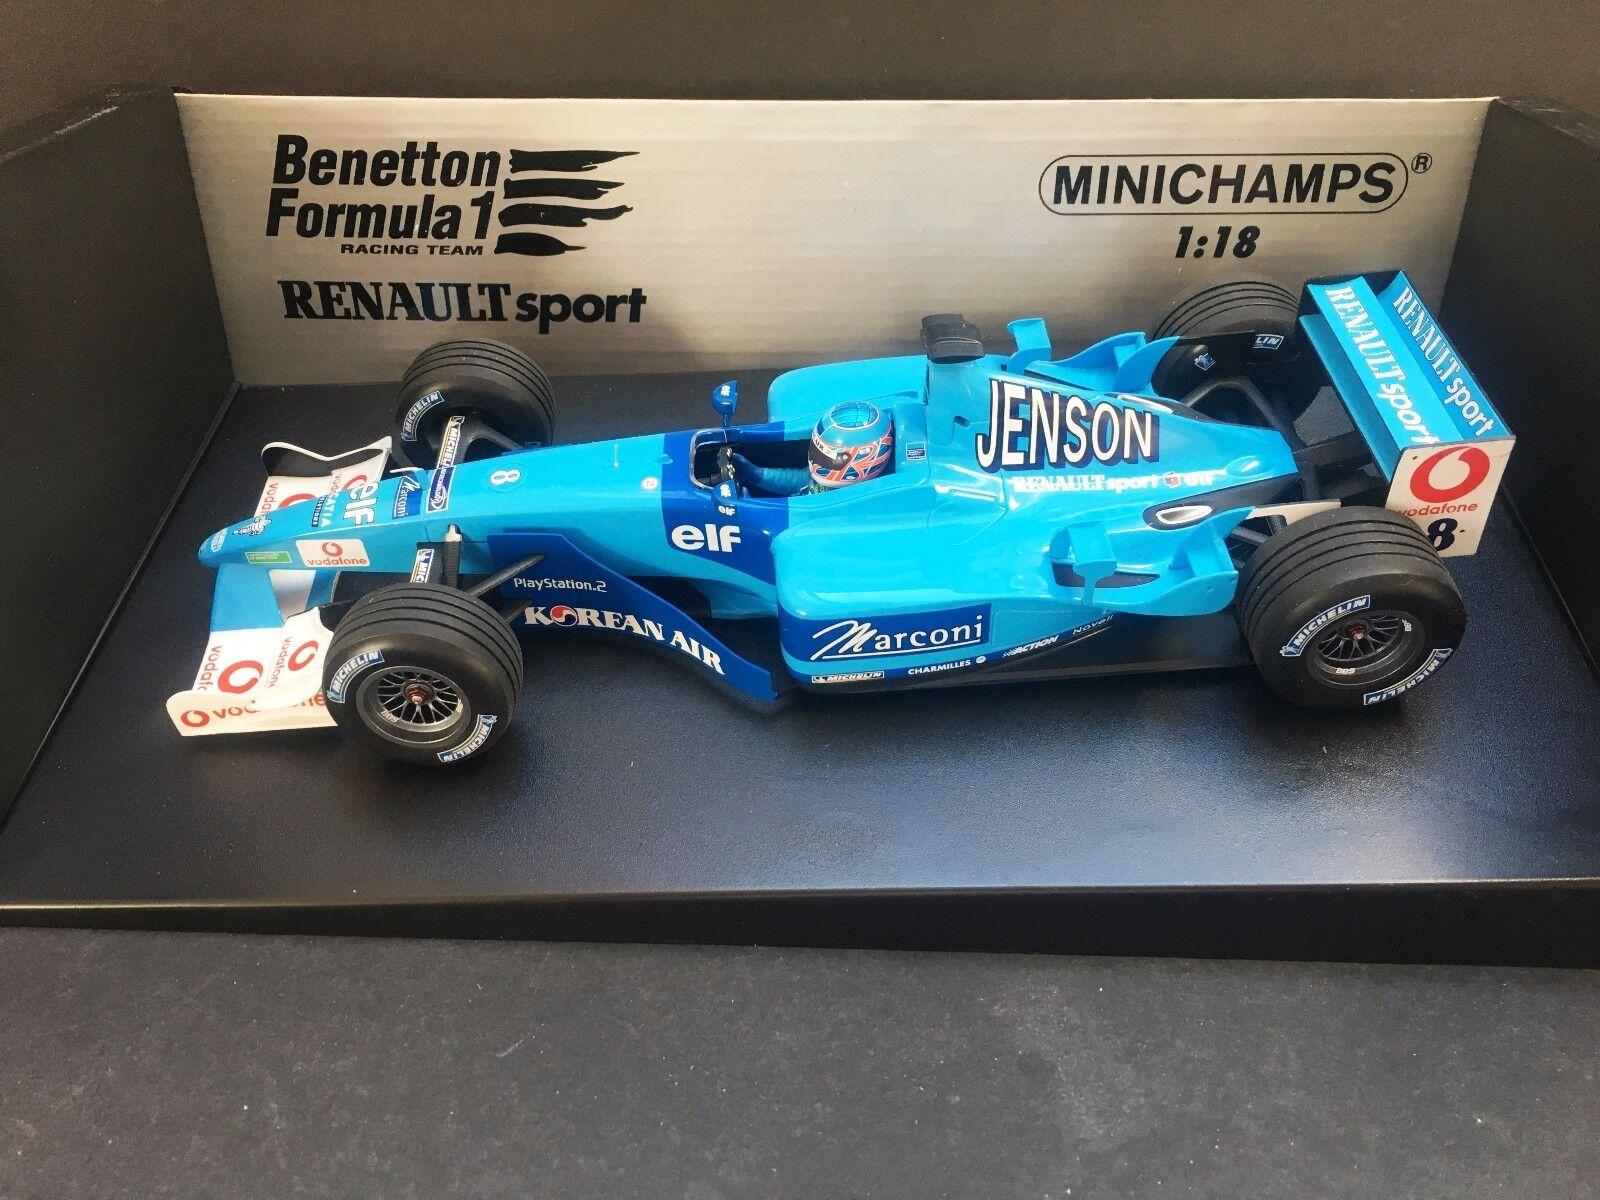 Minichamps - Jenson Button - Benetton - B201 -  1 18 - 2001 - Rare